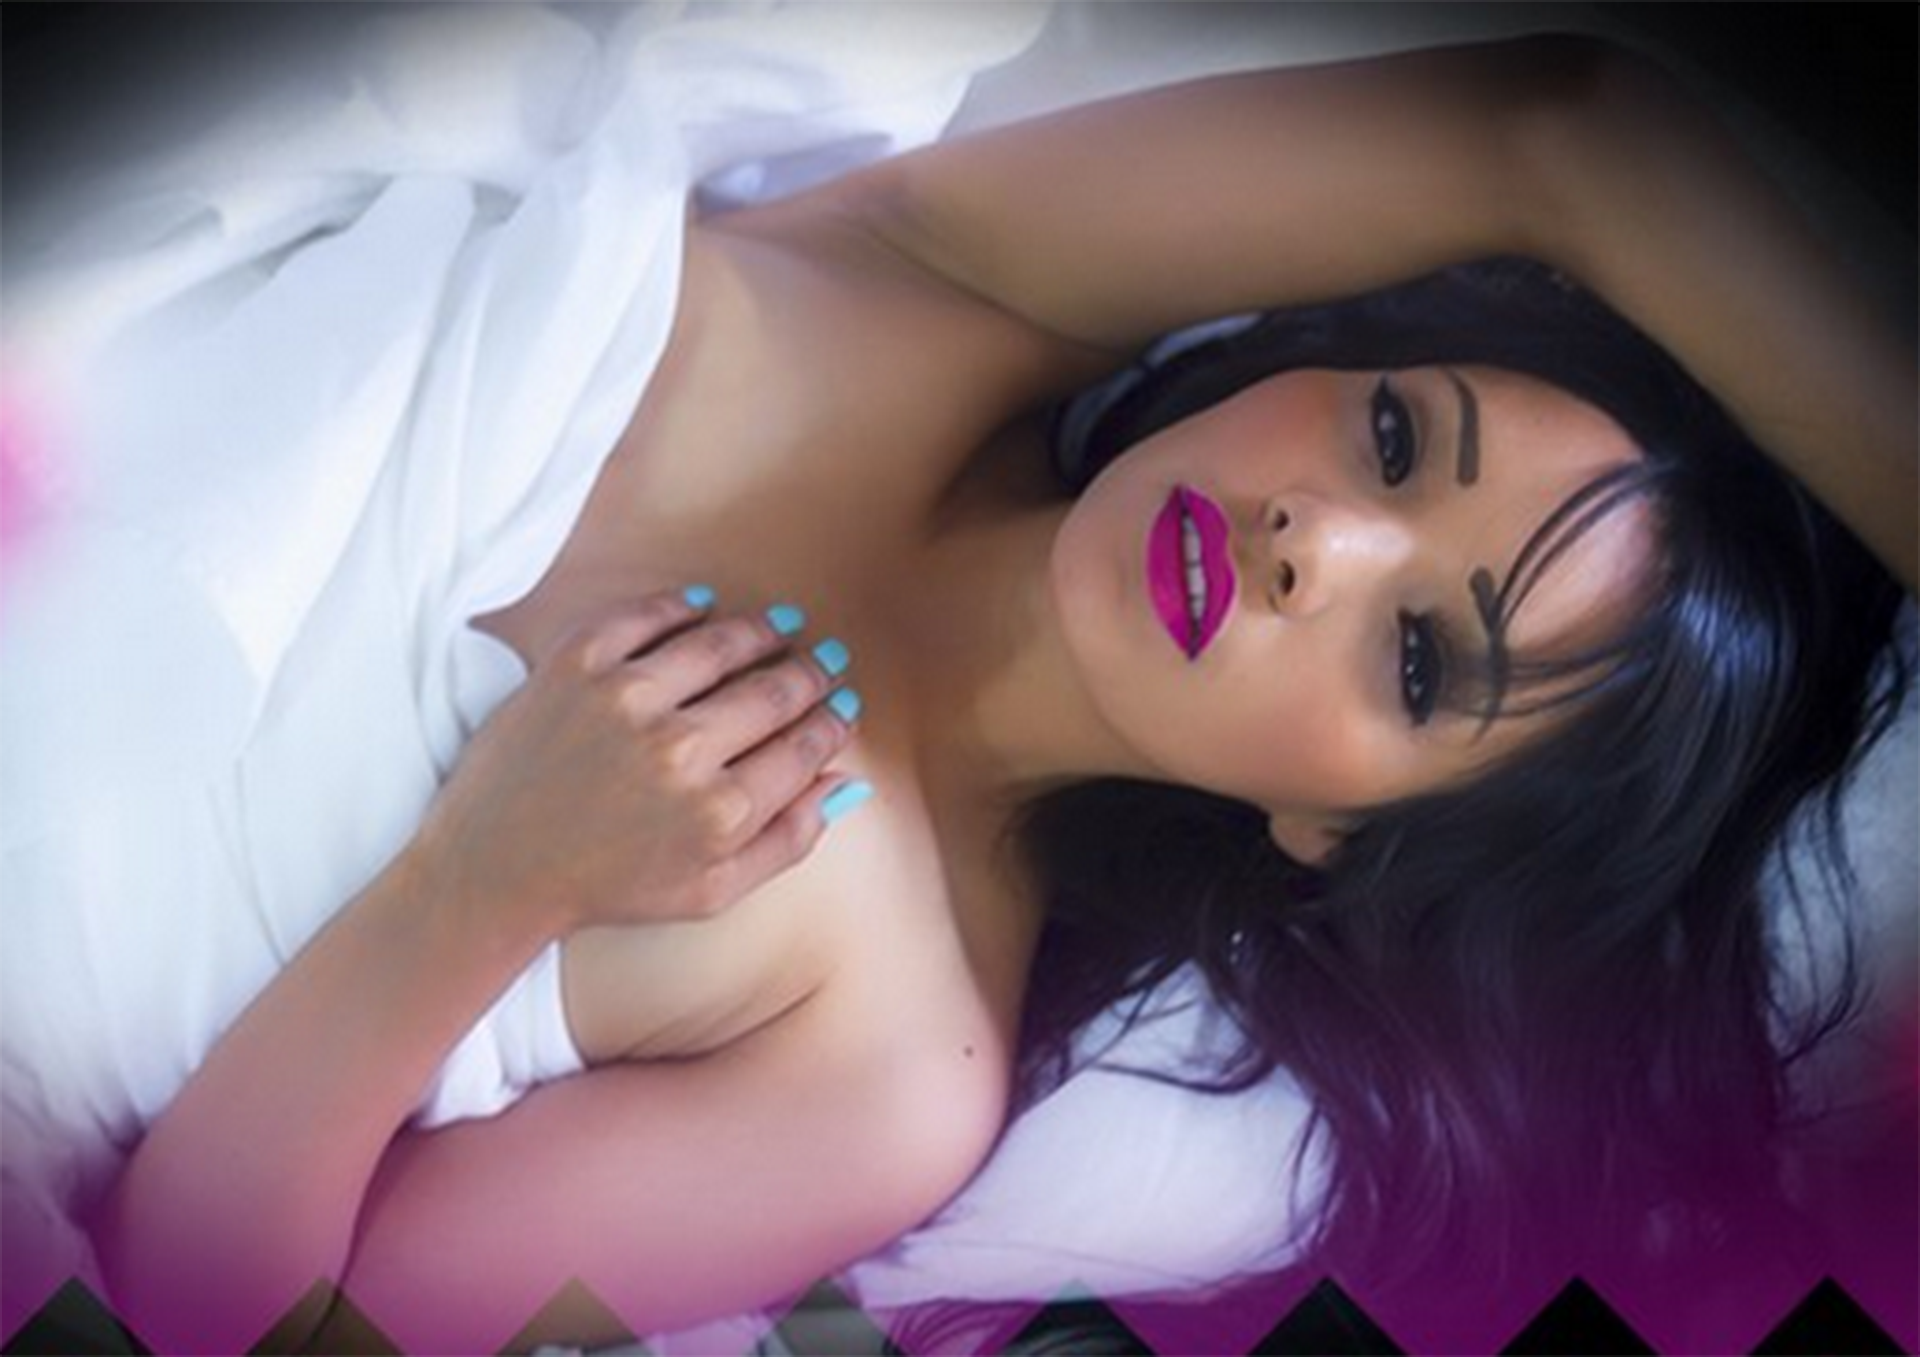 Actriz Porno Francesa Morena actriz porno en méxico lanzó un sorteo para actuar con ella